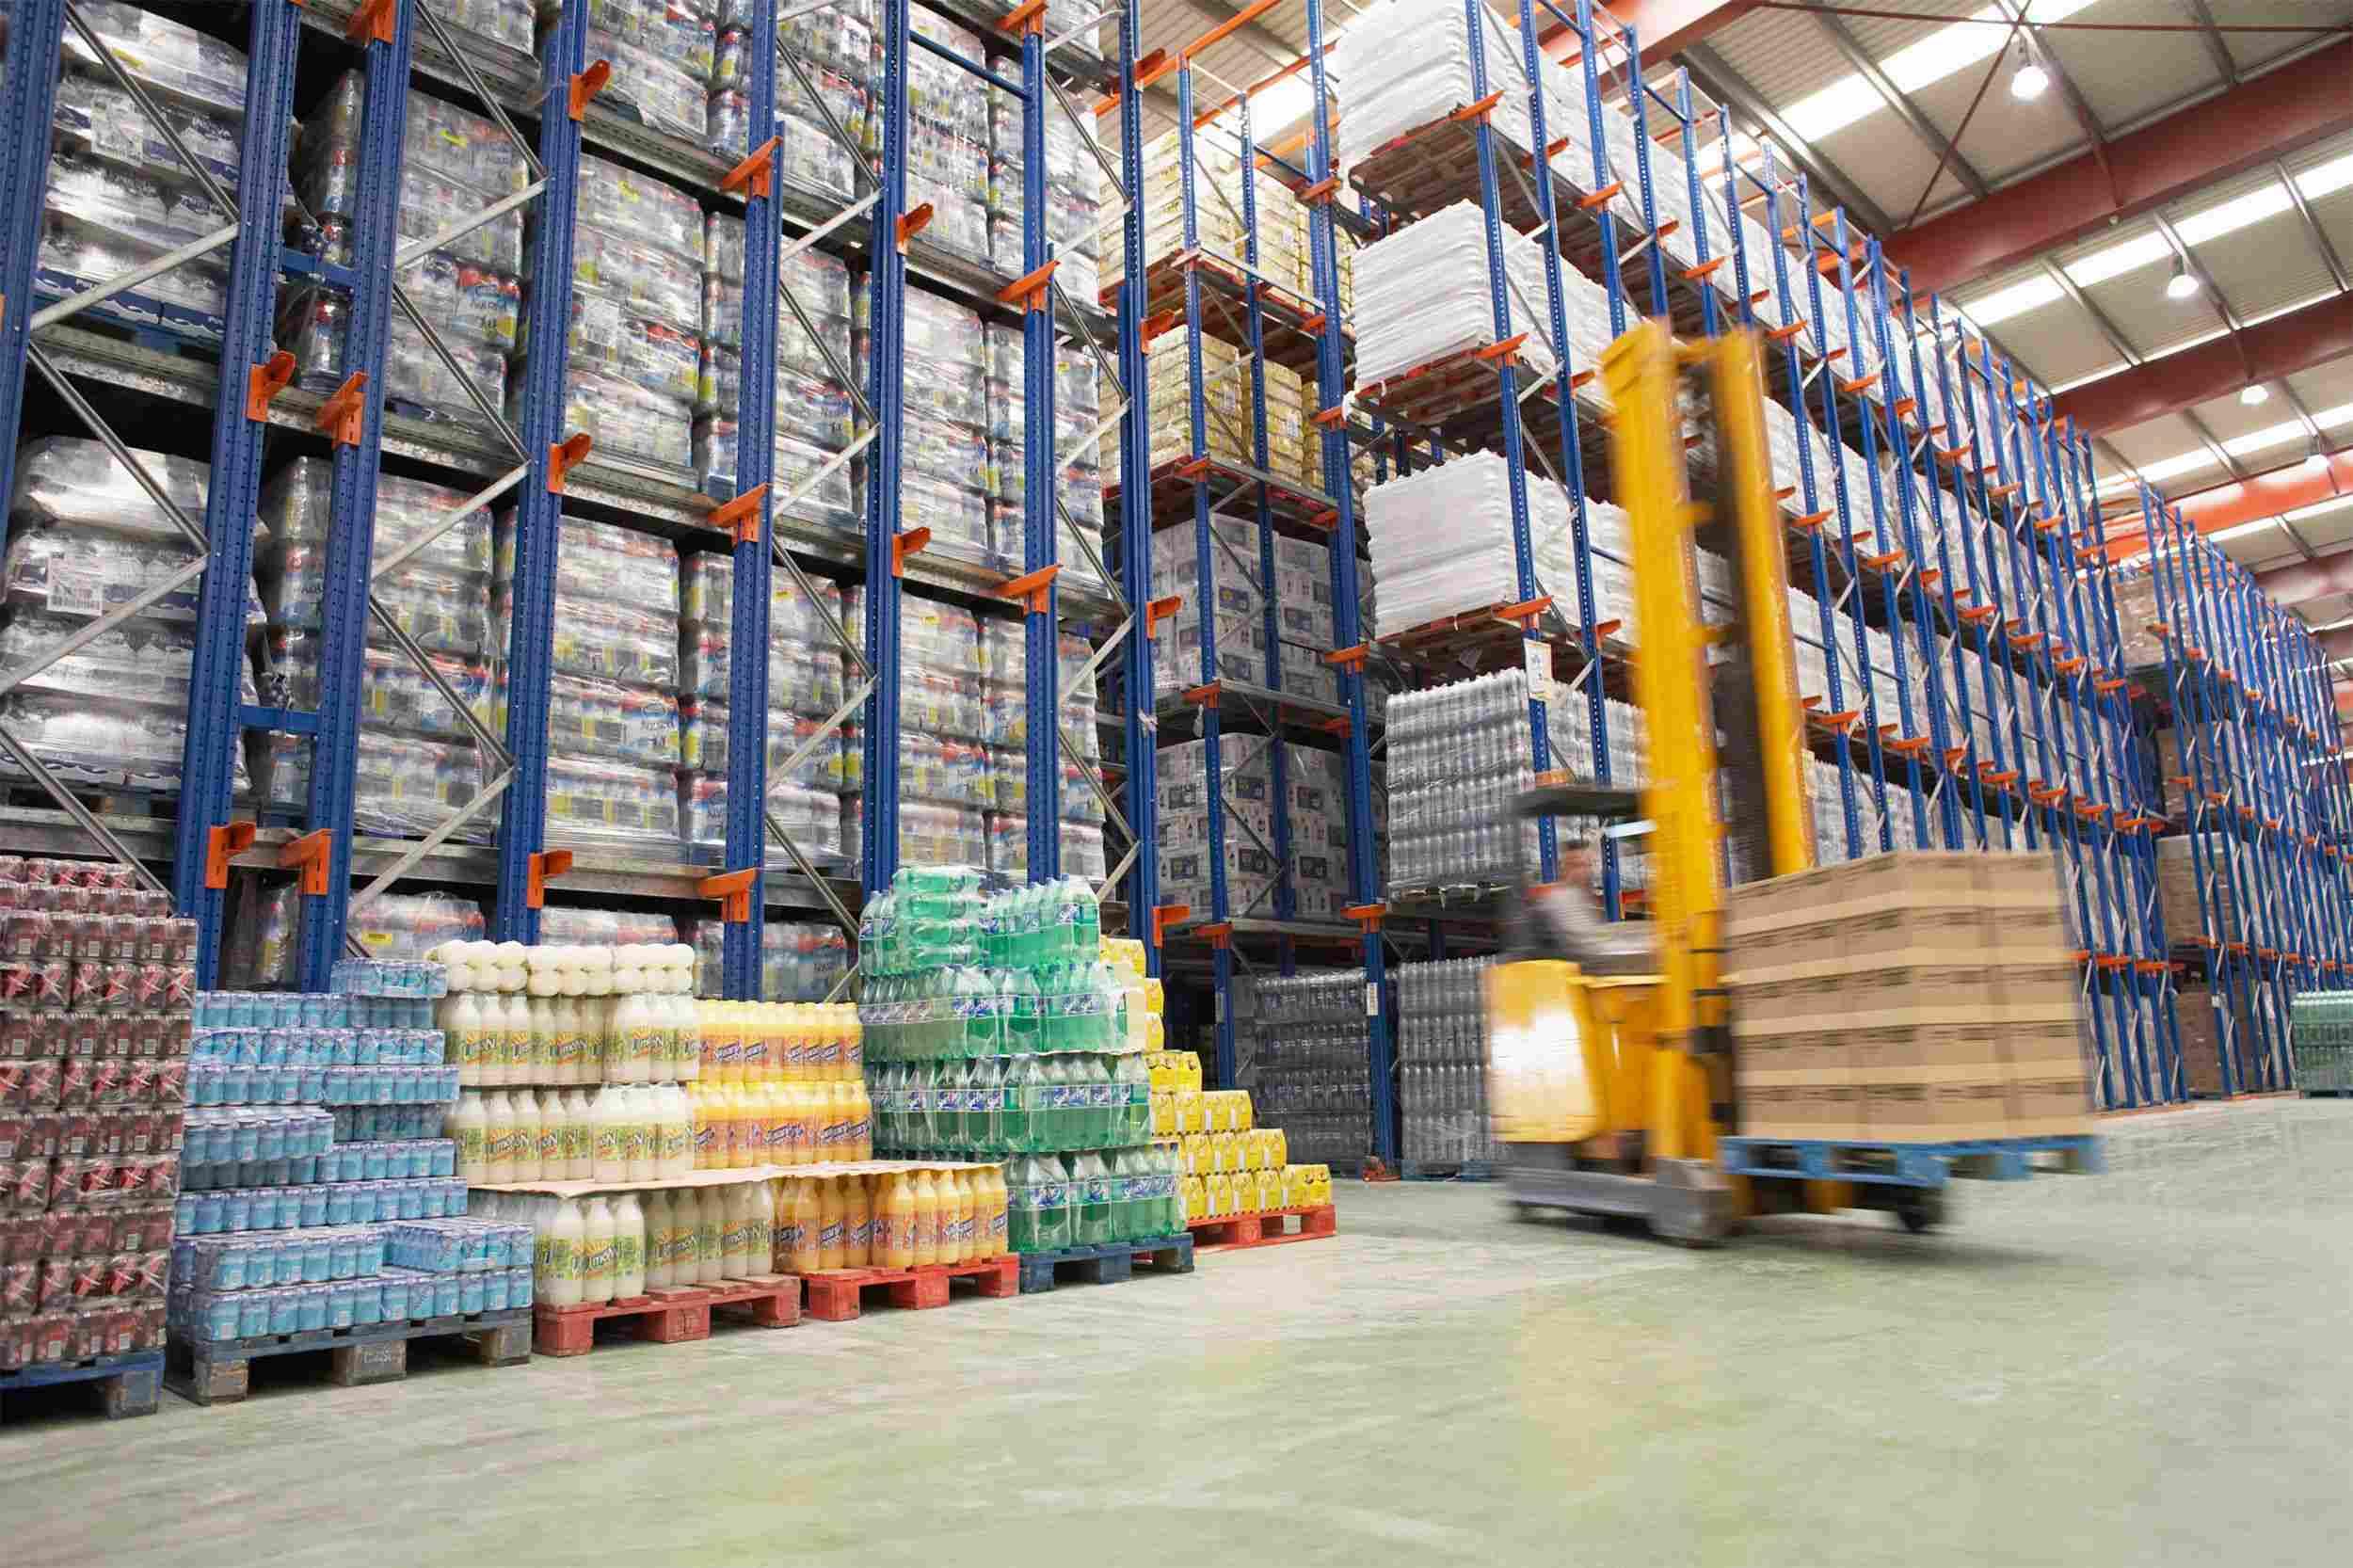 https://www.komanda24.lv/wp-content/uploads/2015/09/Warehouse-and-lifter.jpg